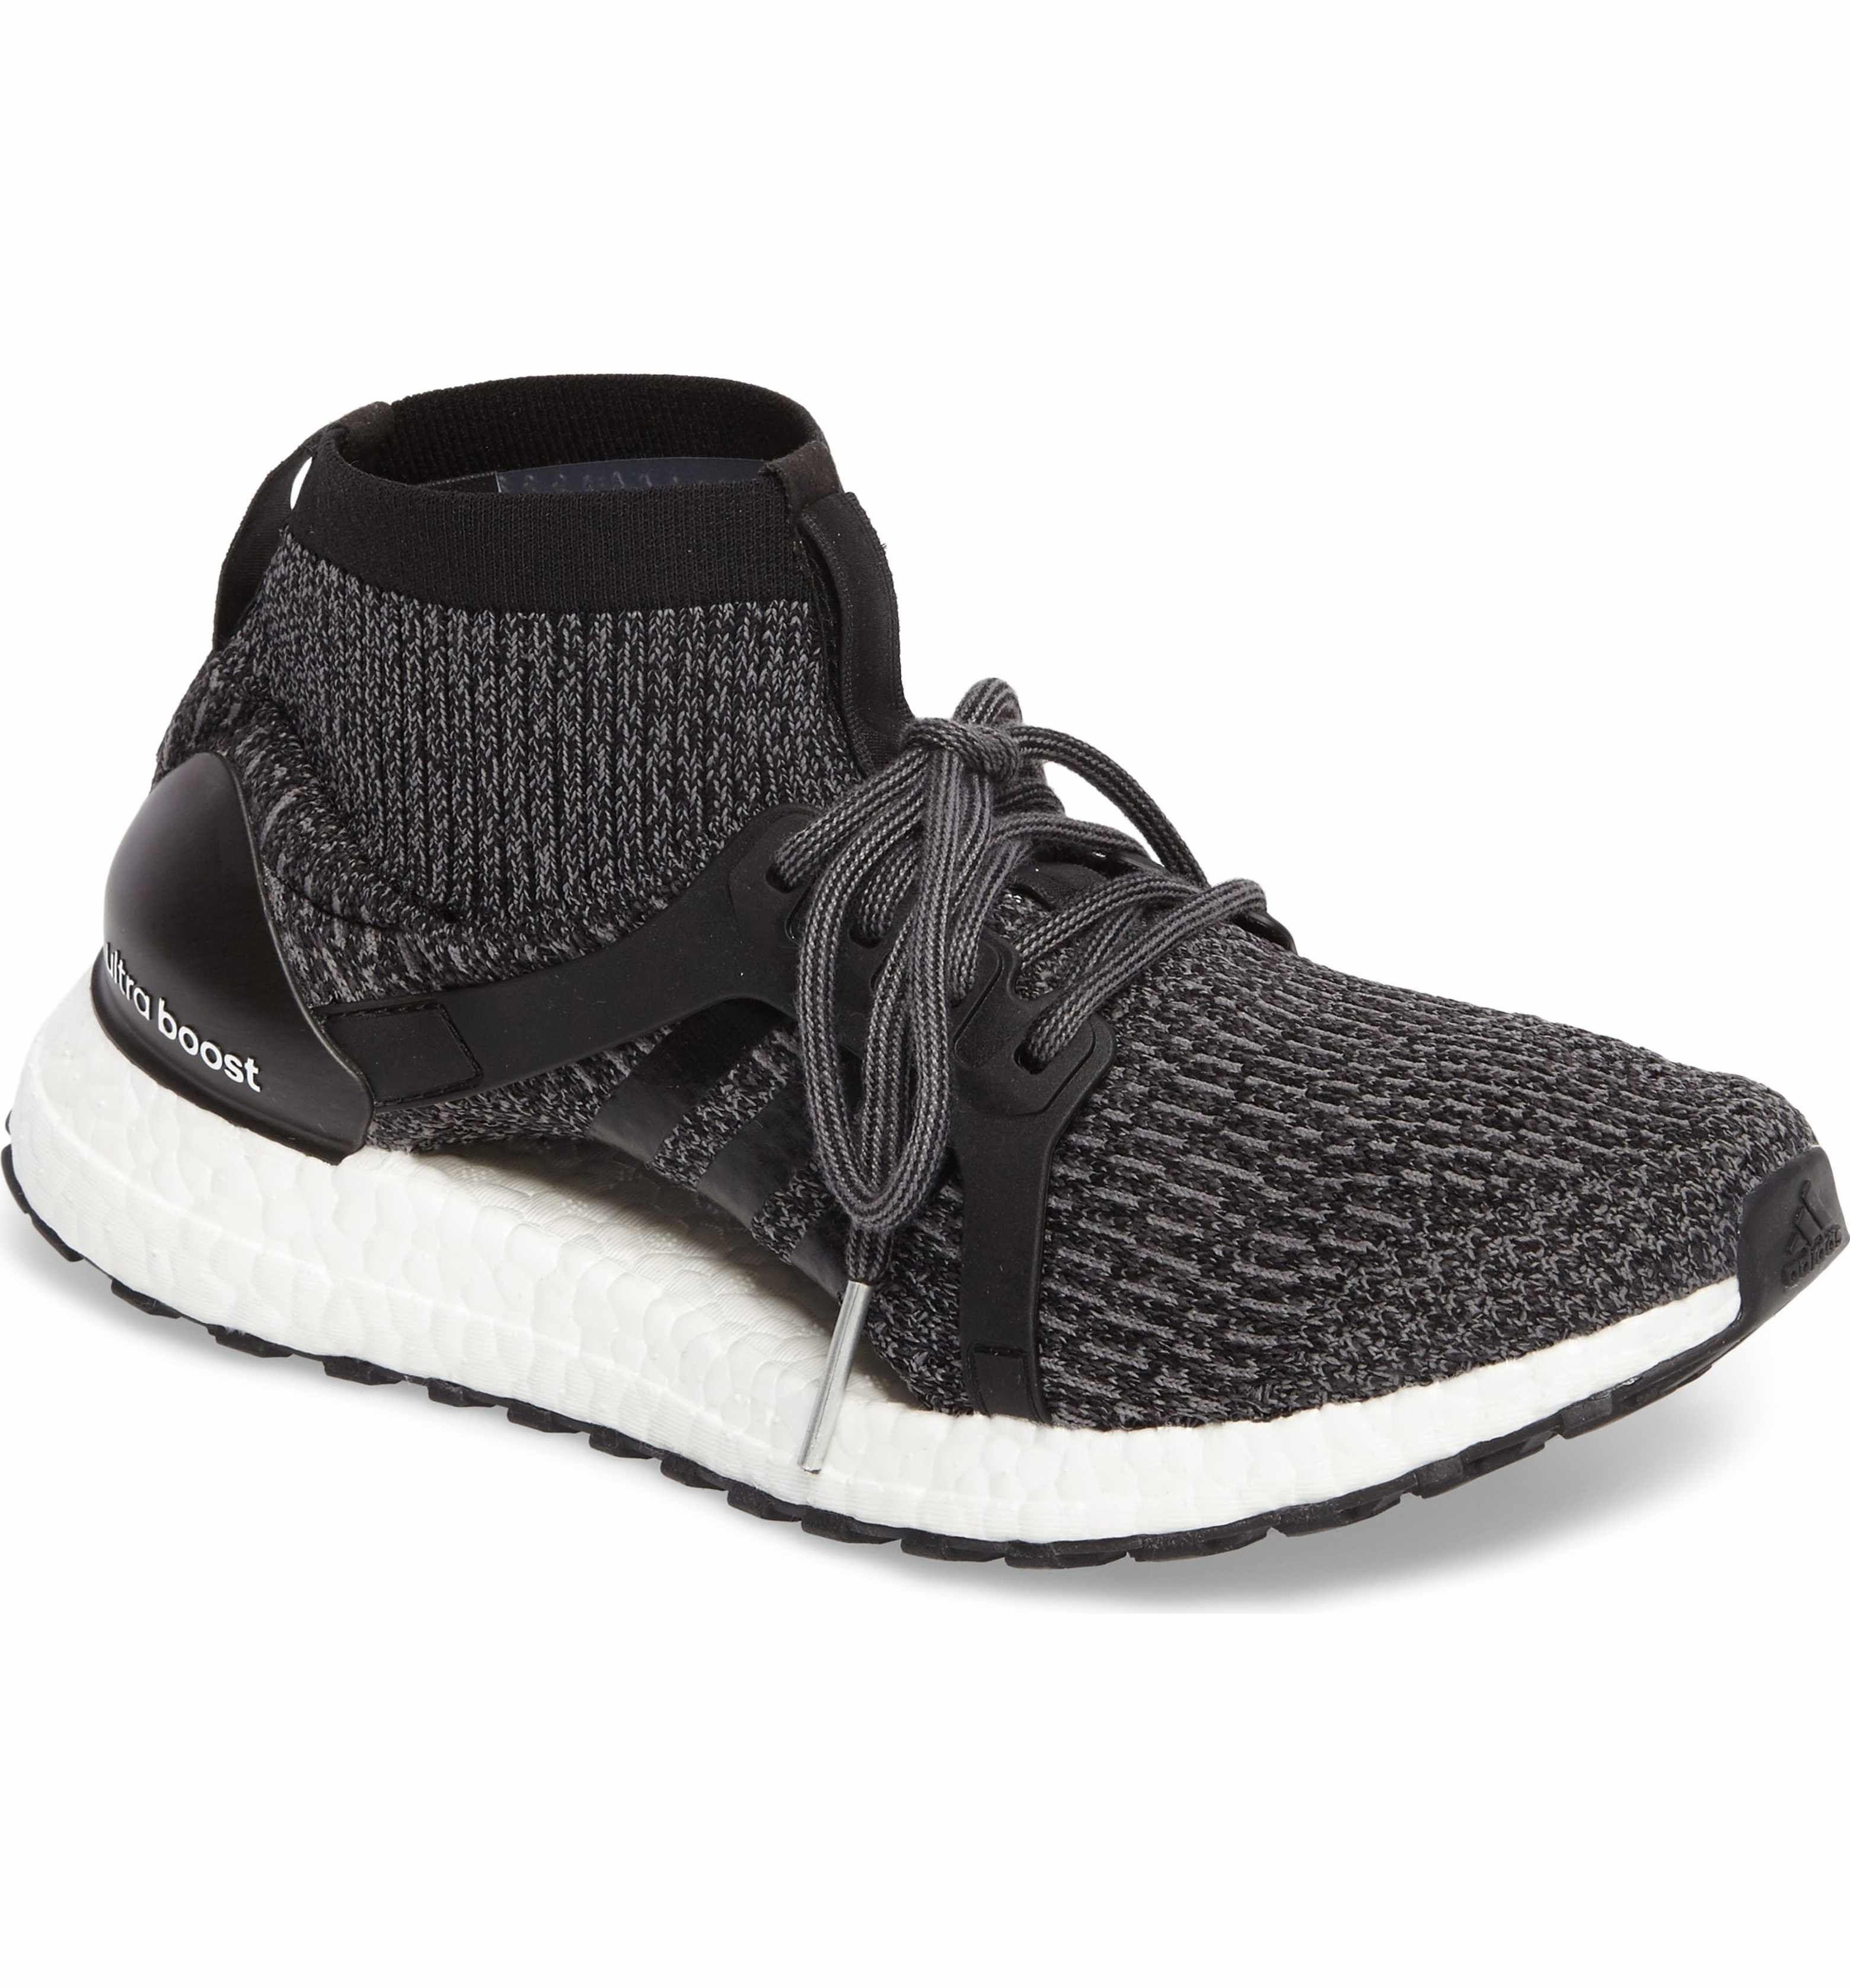 6dc53871c Main Image - adidas Ultraboost X All Terrain Running Shoe (Women ...